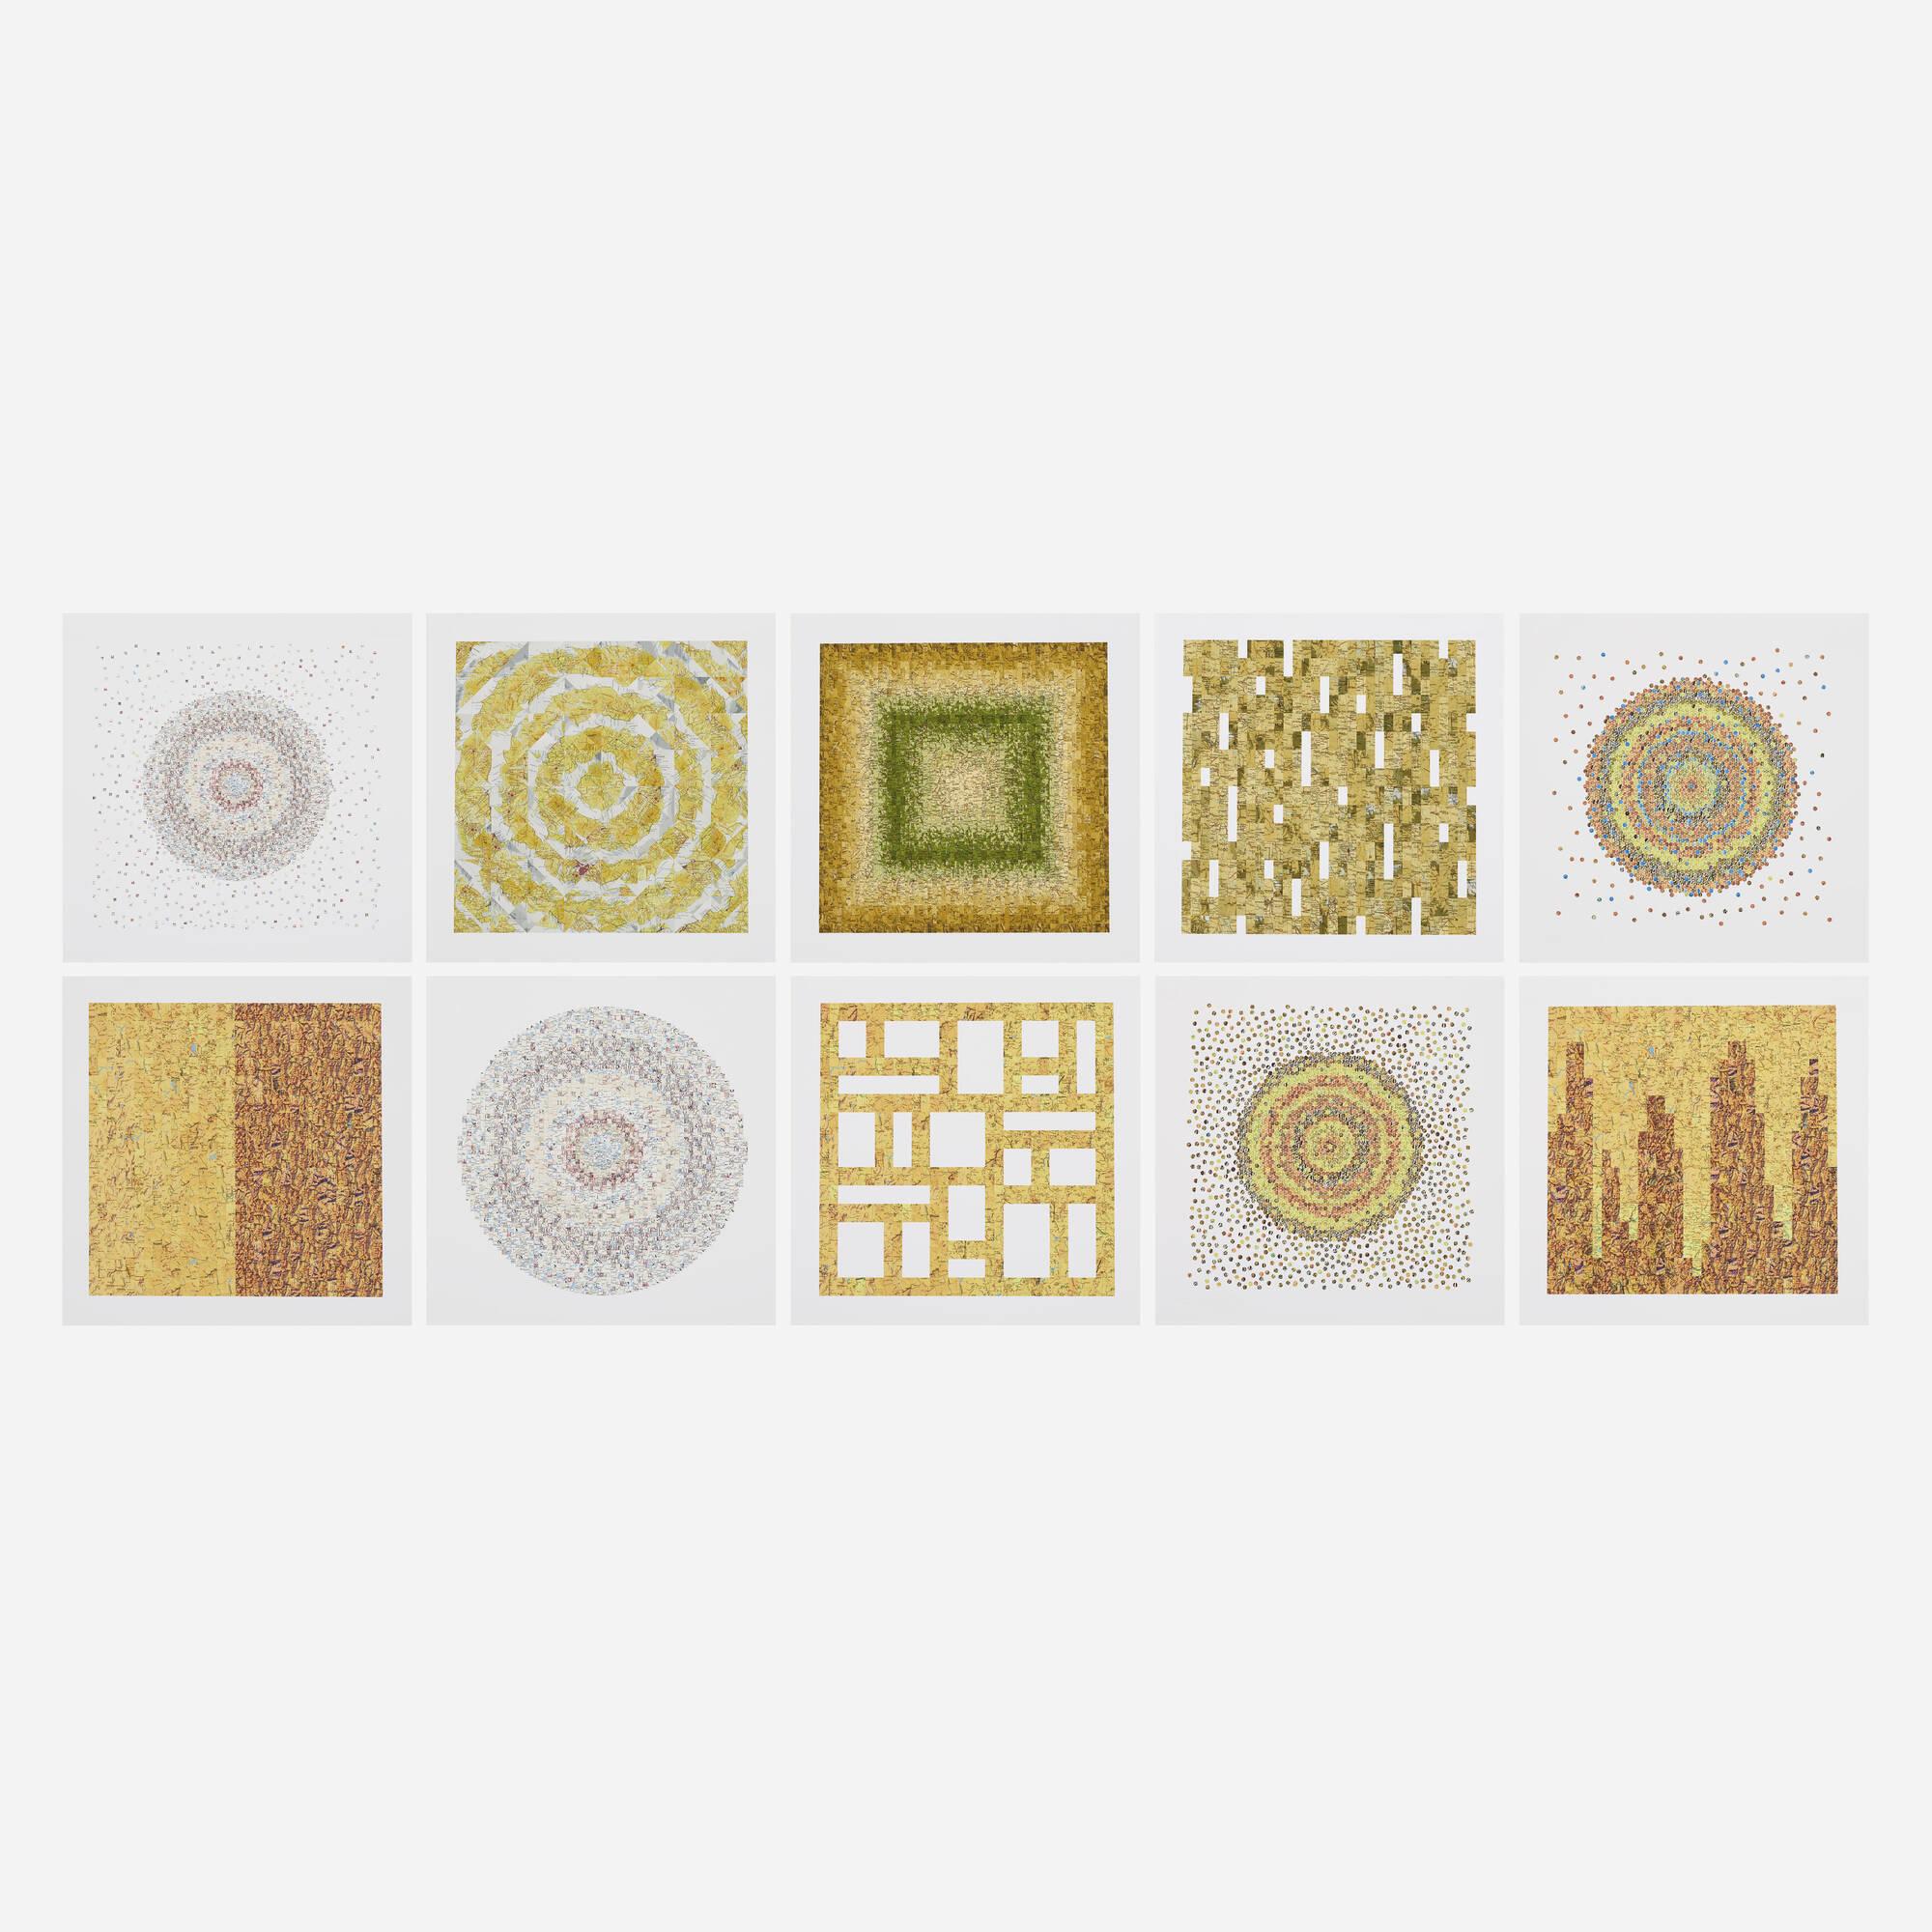 107: Peter Wegner / Reverse Atlas (ten works) (1 of 2)